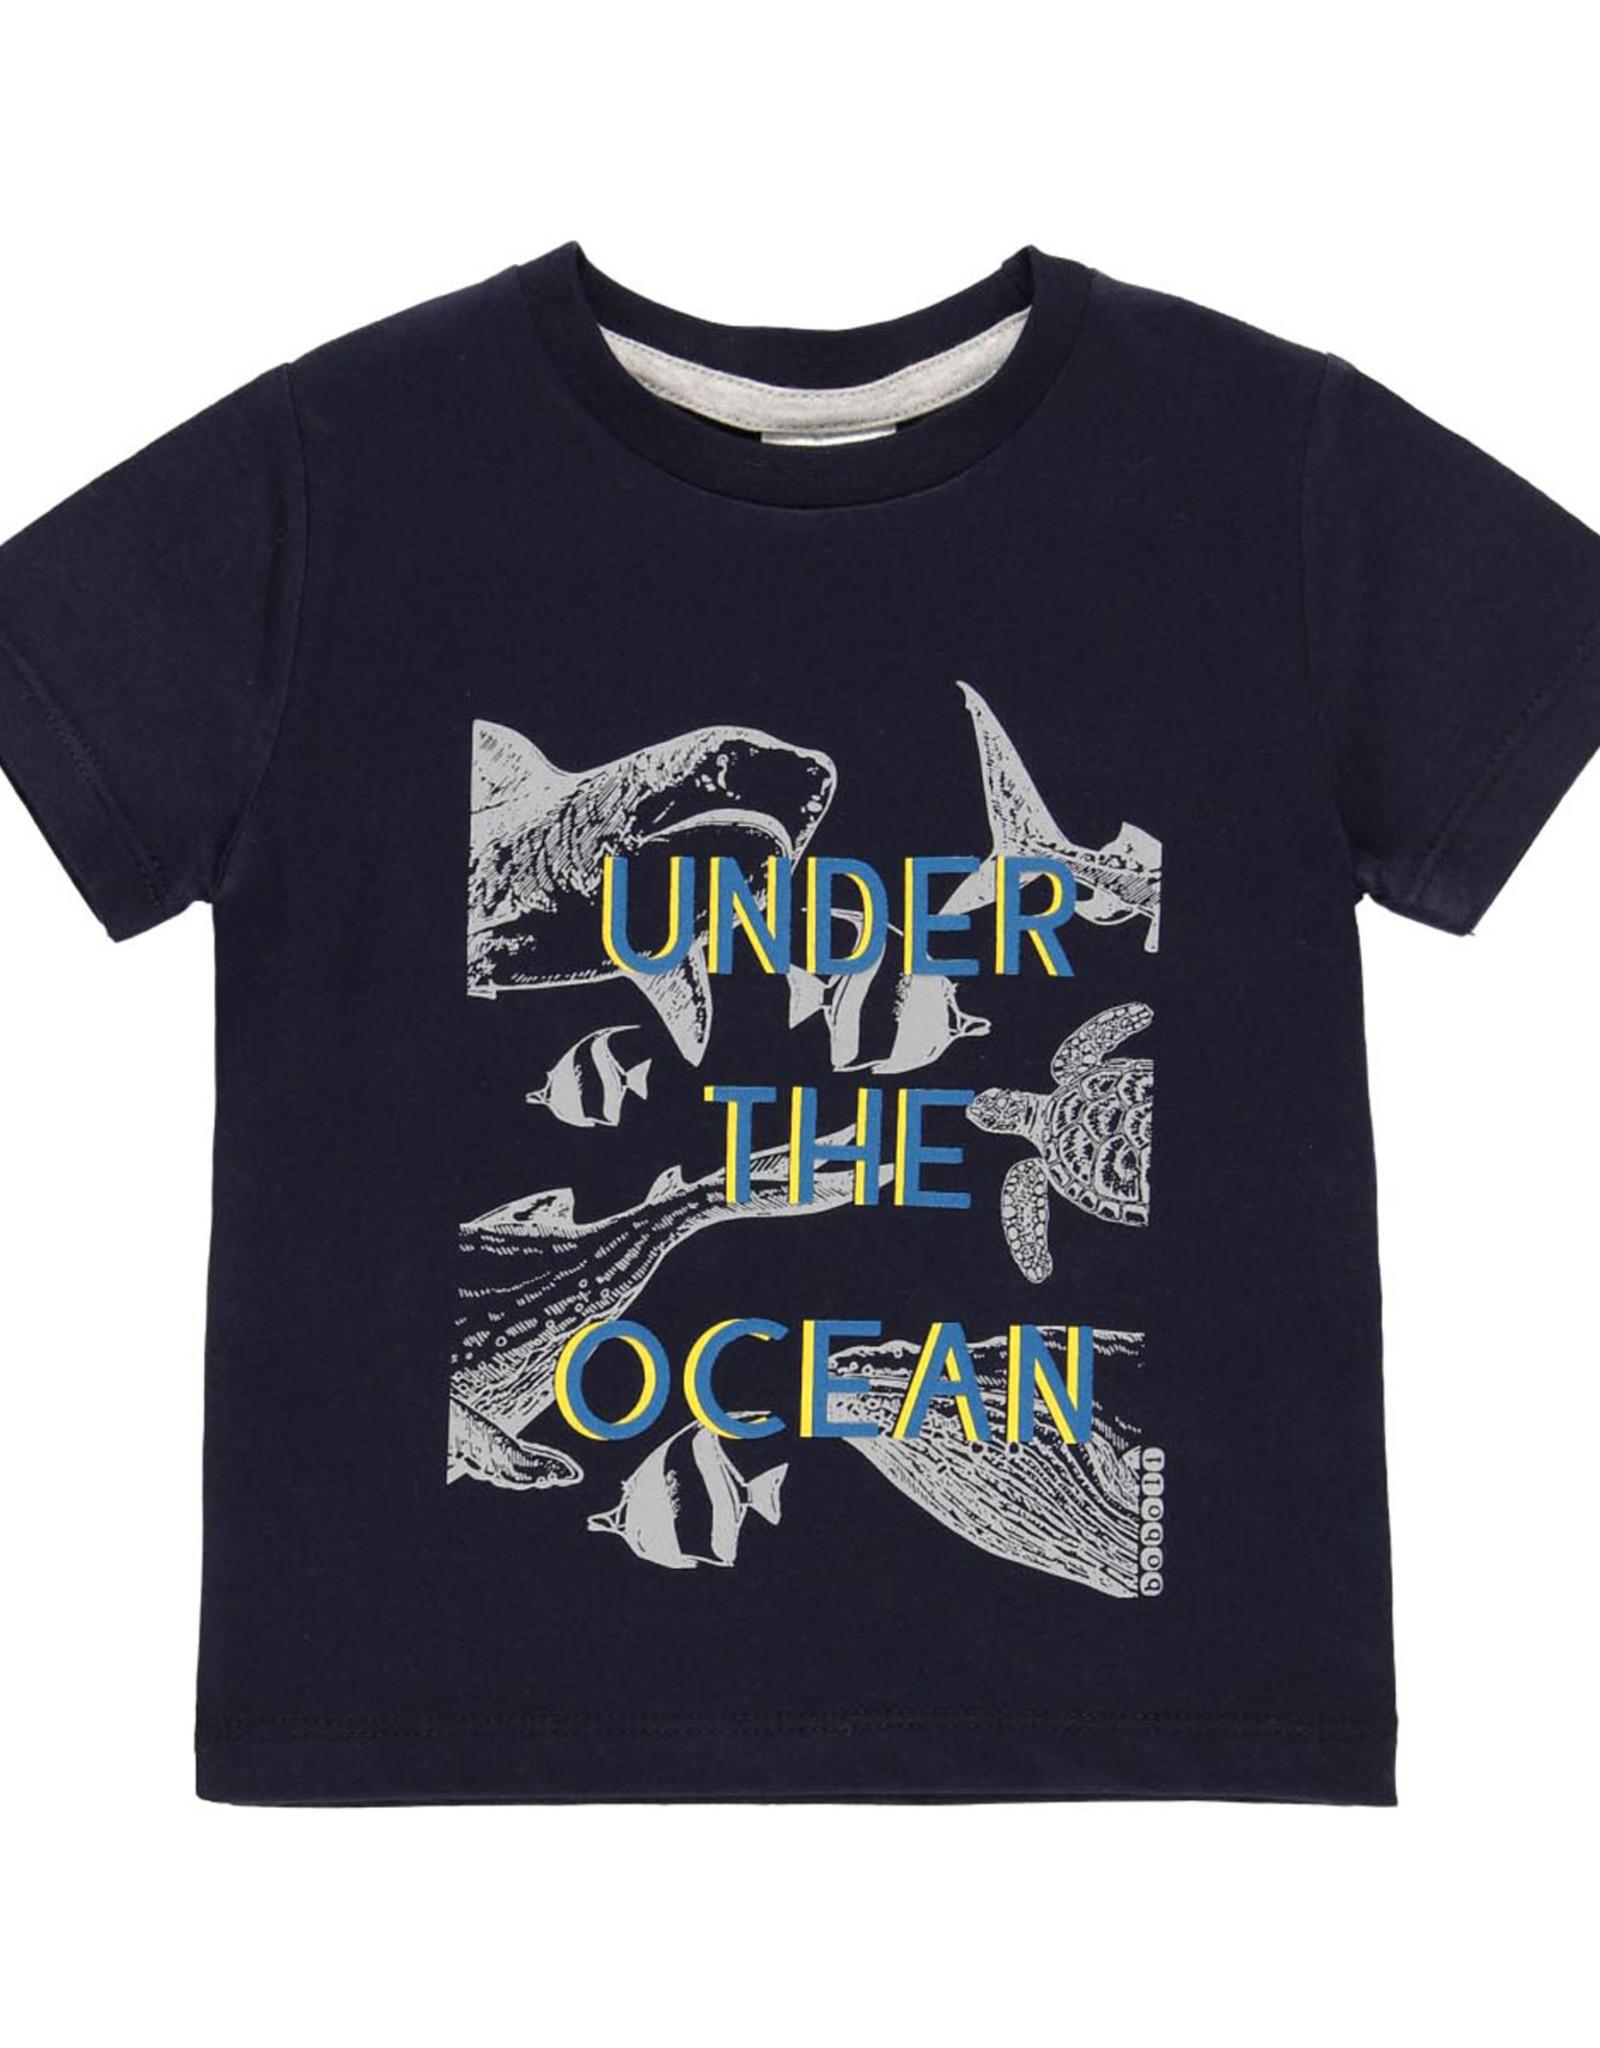 Boboli Tee Shirt, Under the Ocean, Sharks